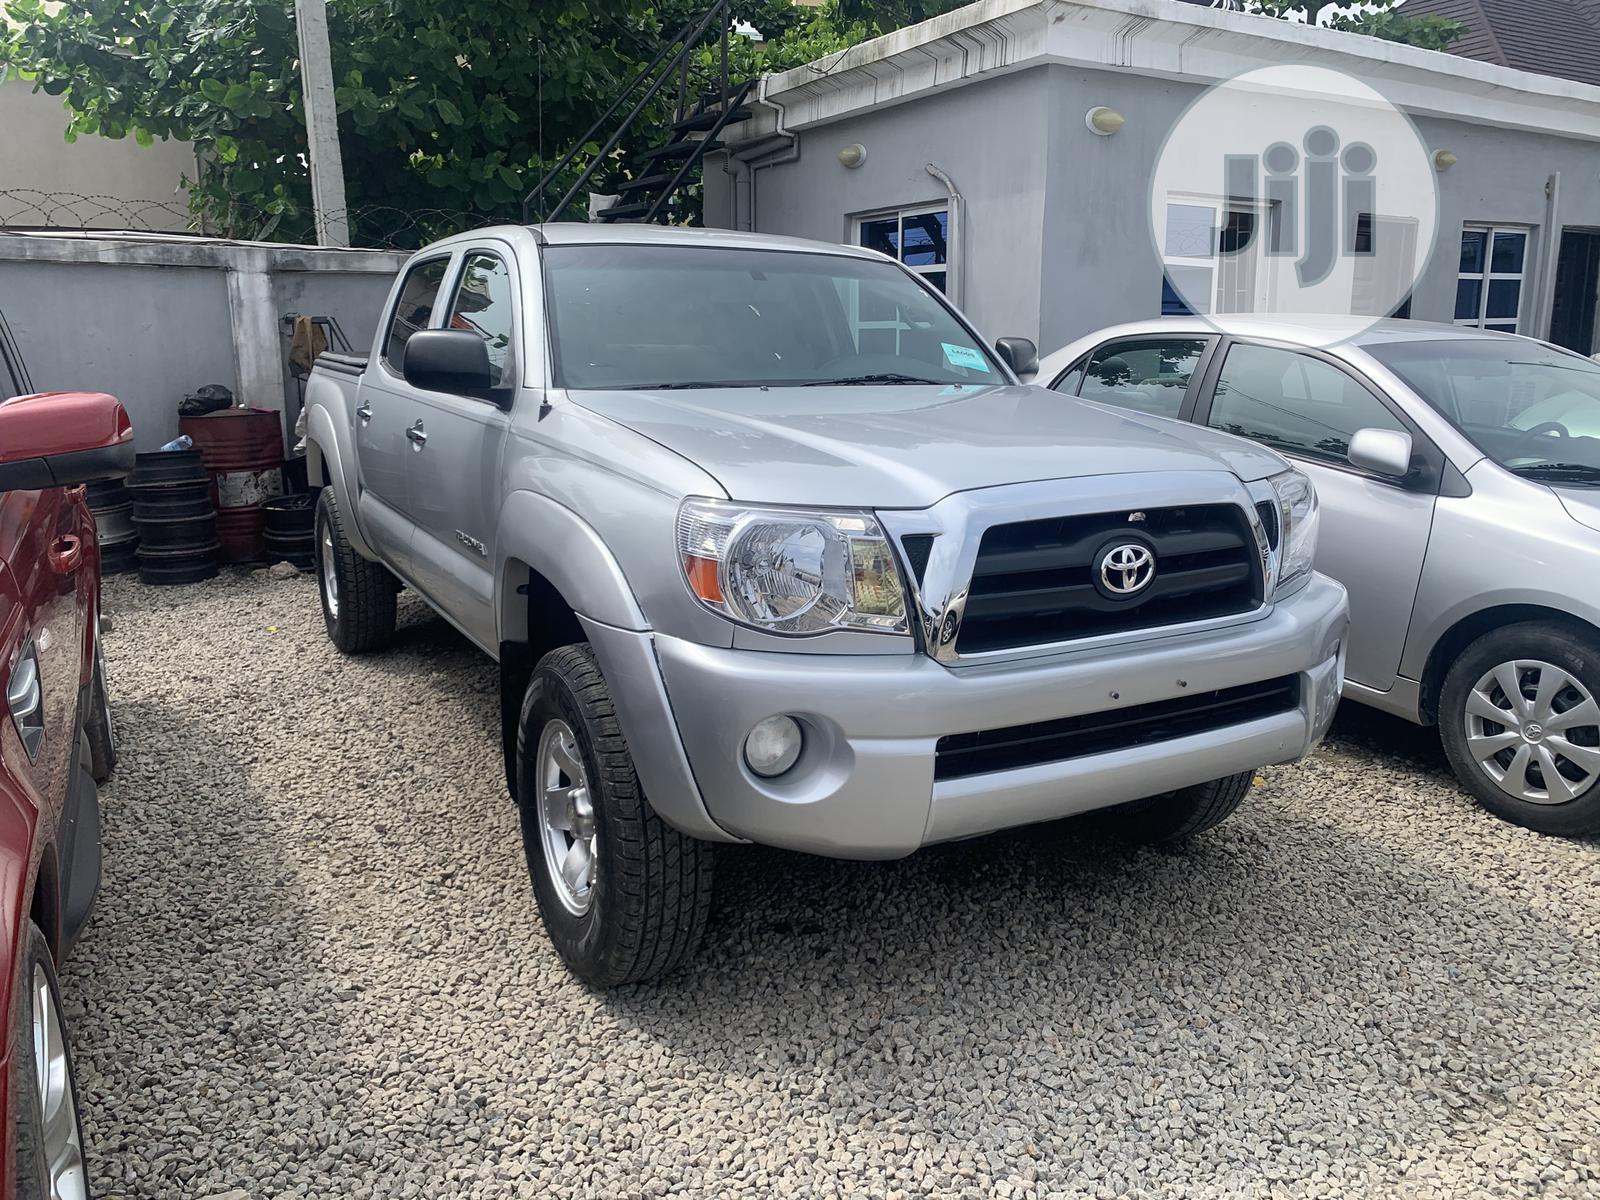 Toyota Tacoma 2005 Silver | Cars for sale in Amuwo-Odofin, Lagos State, Nigeria